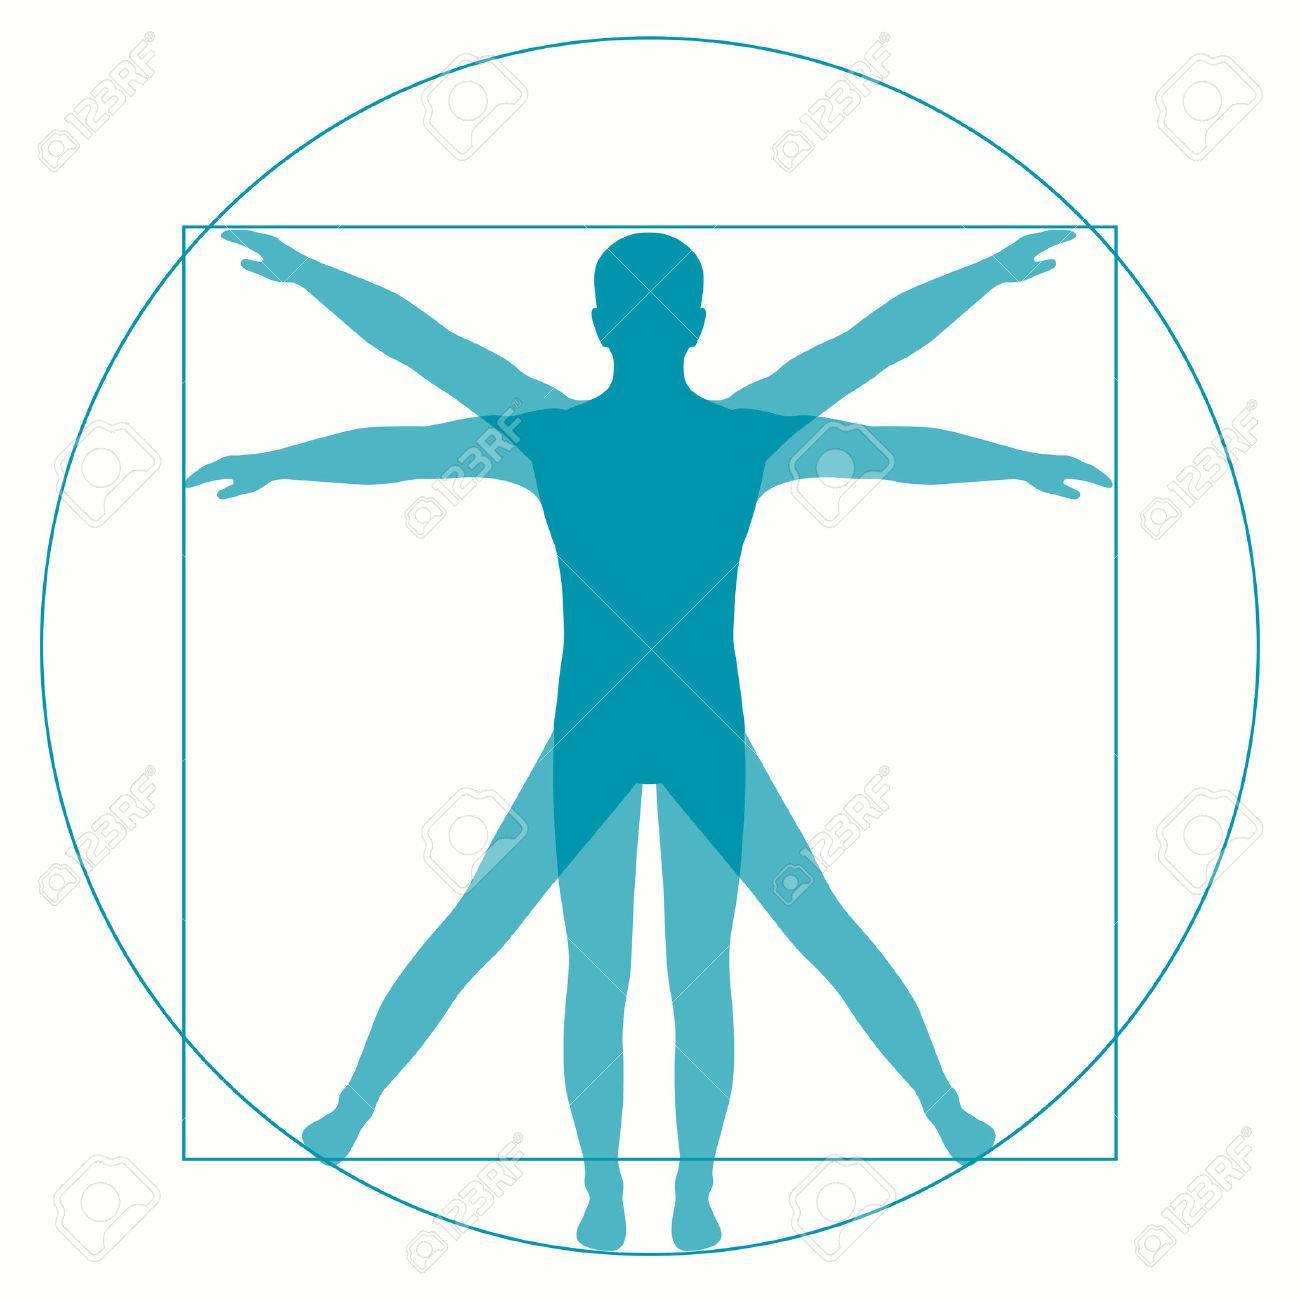 Vetruvian Man Leonardo Da Vinci Human Anatomy Royalty Free Cliparts